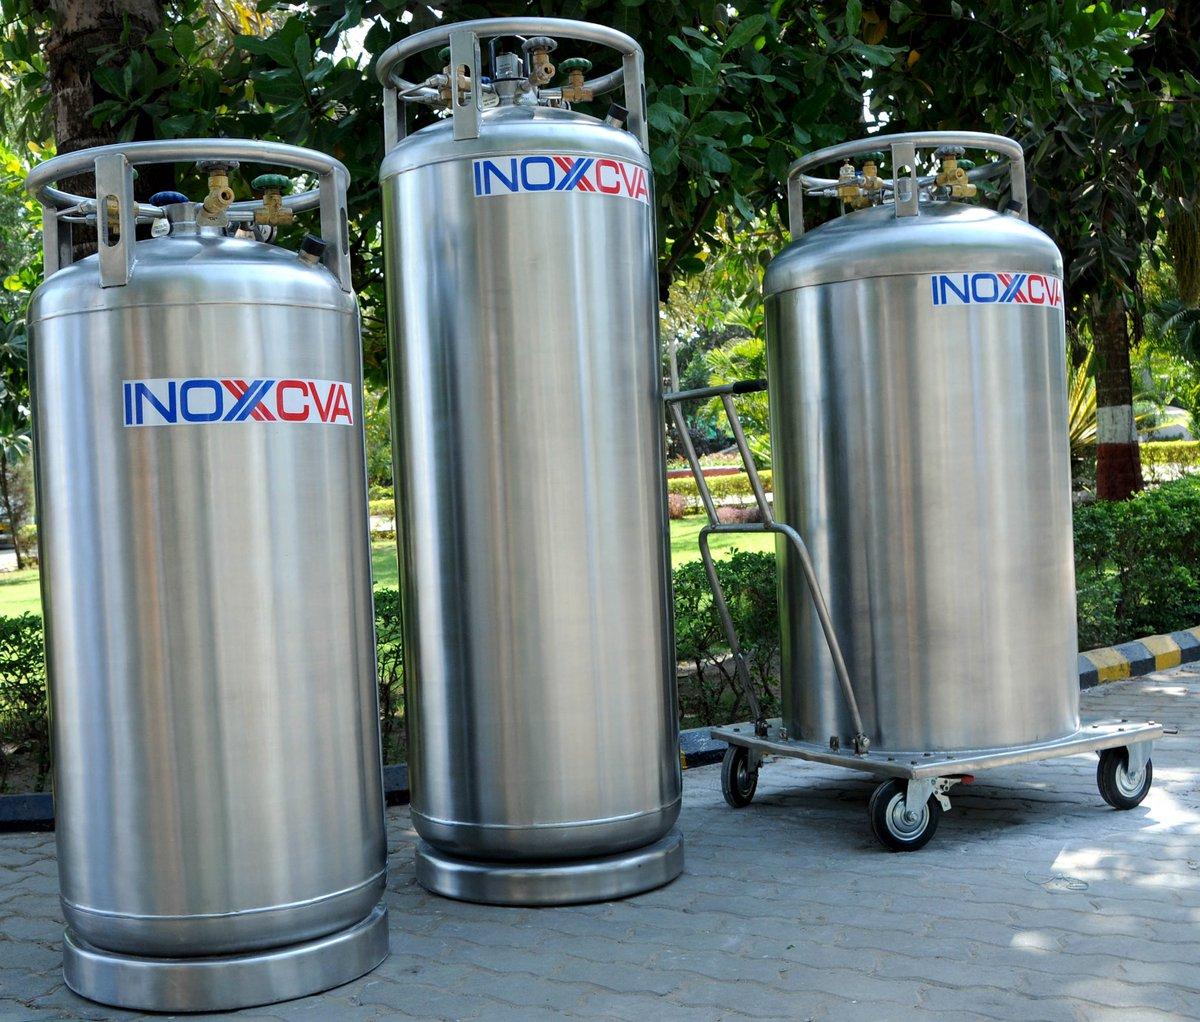 inoxcva on twitter microcyl liquid cylinders portable mini